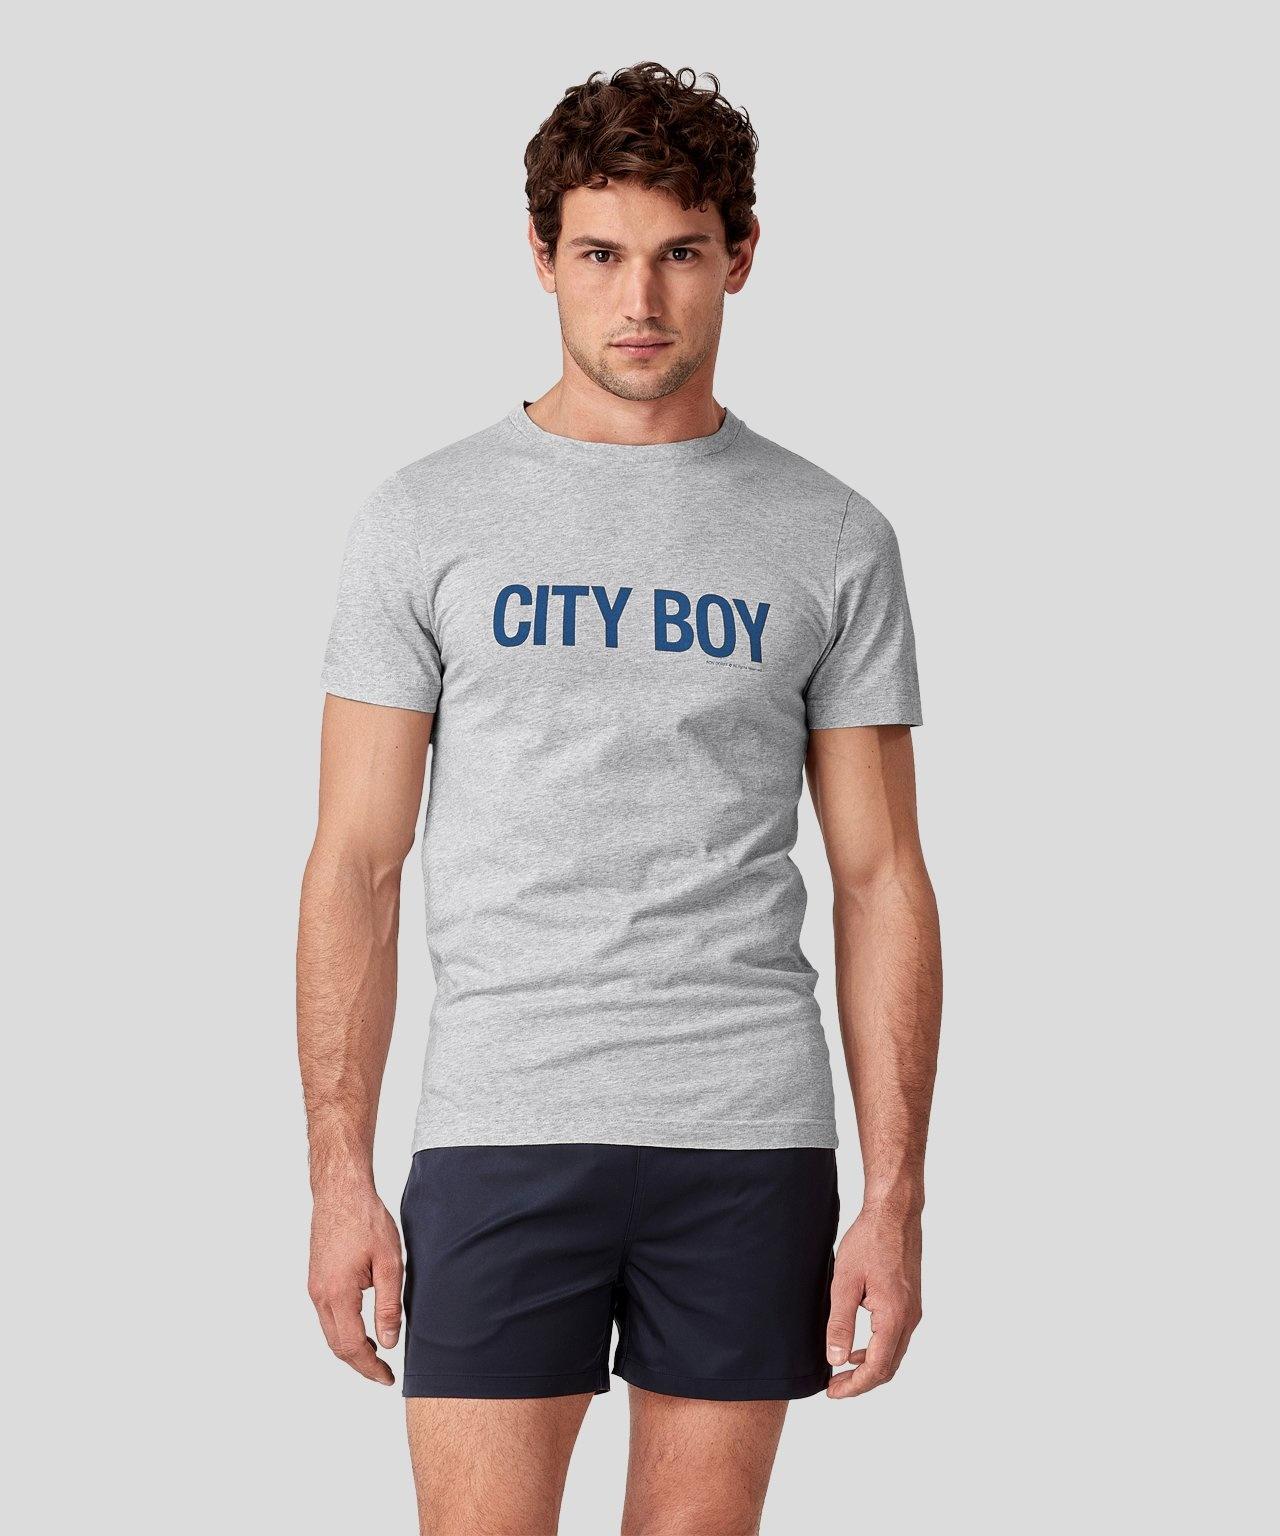 Ron Dorff CITY BOY t-shirt